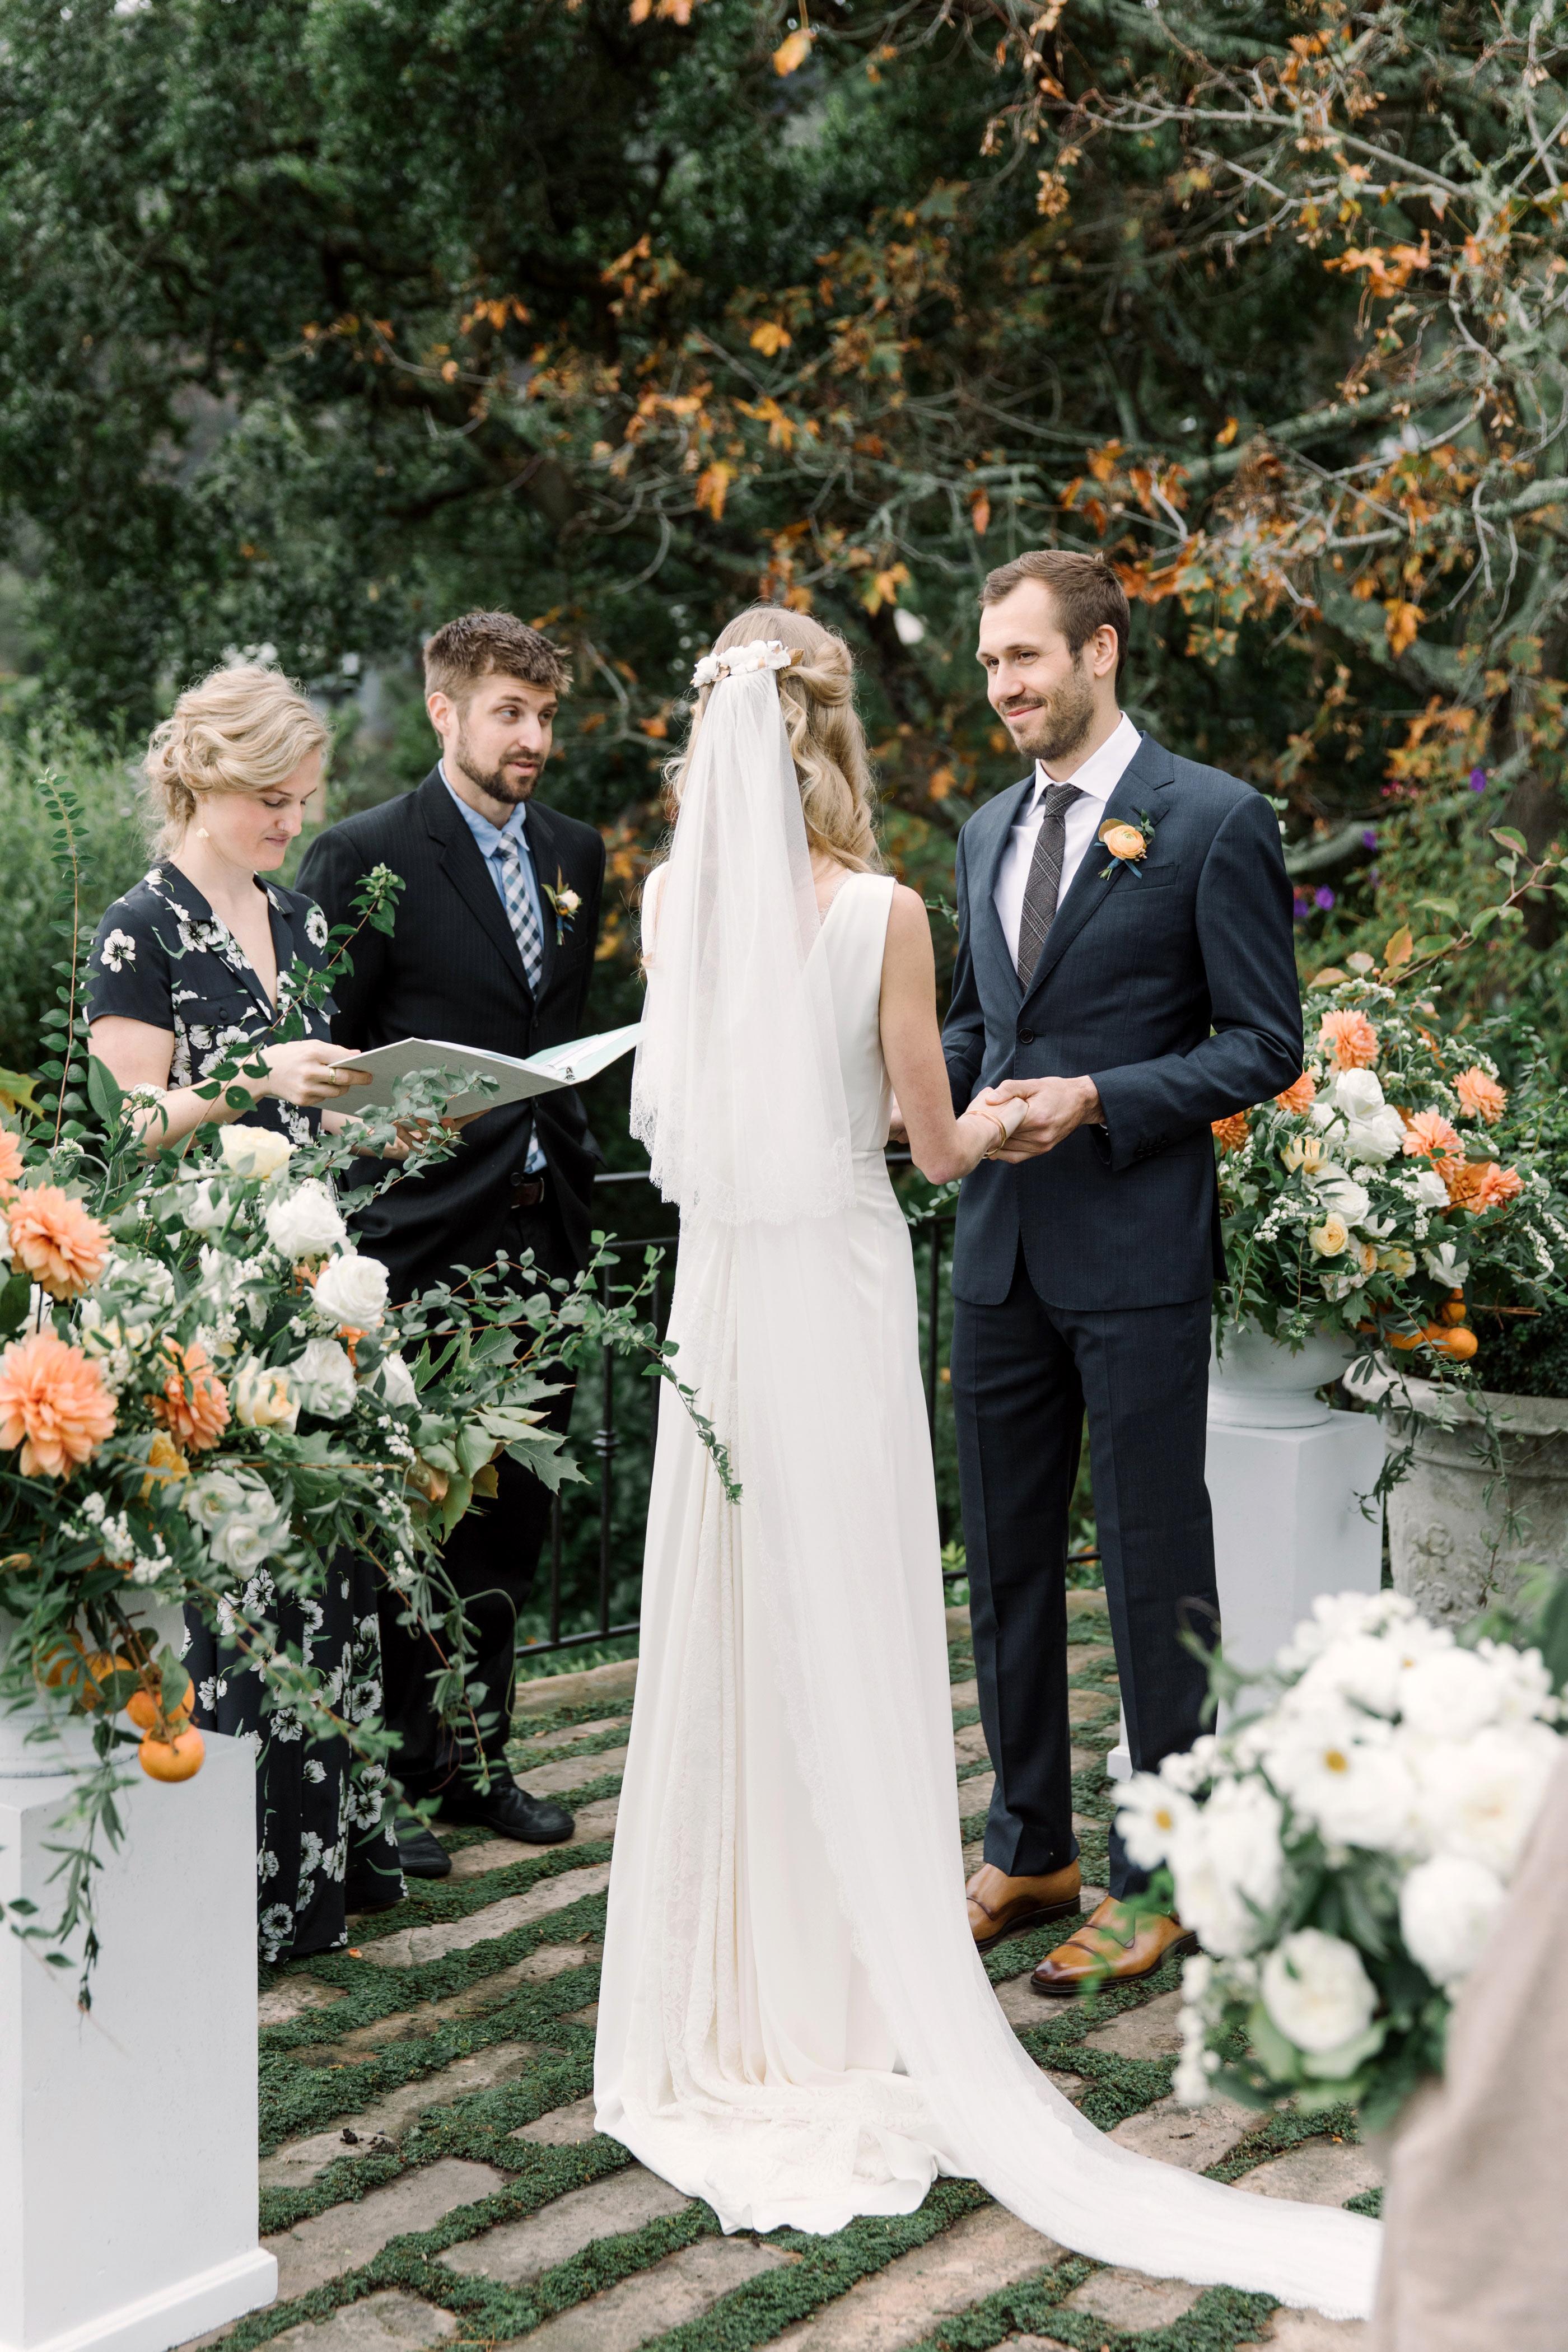 gillian marcus wedding ceremony vows